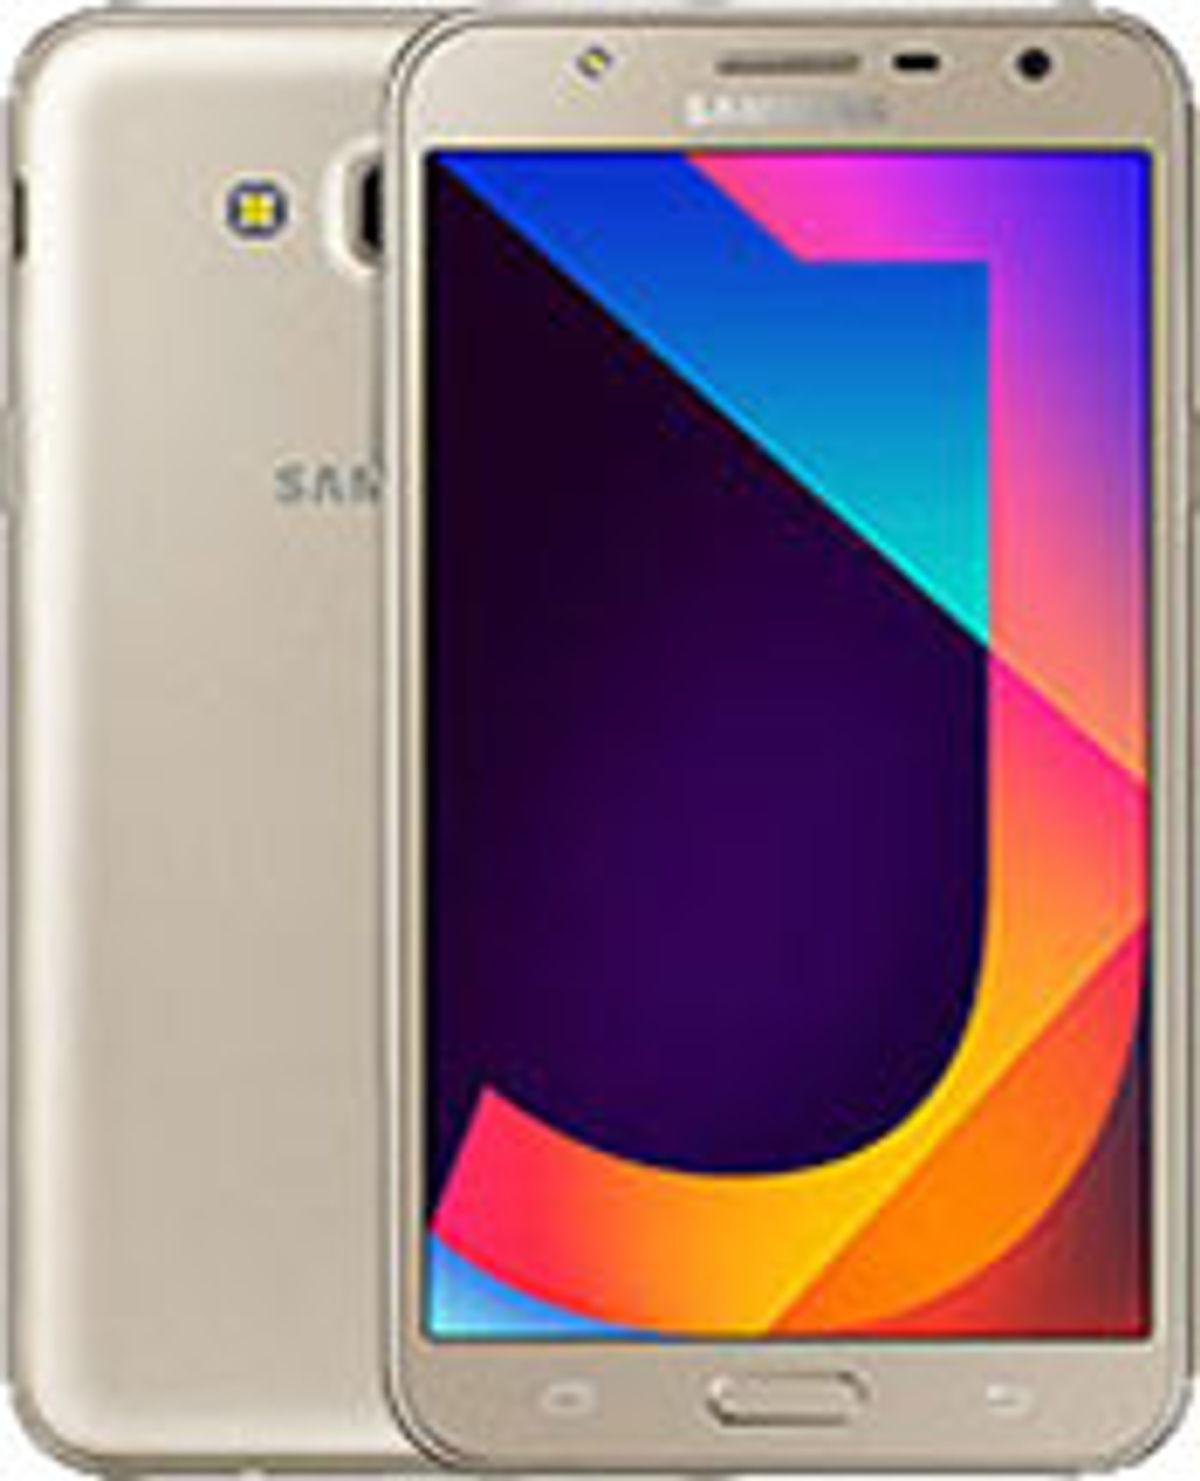 Best Samsung Phones Under 15000 - September 2019 in India